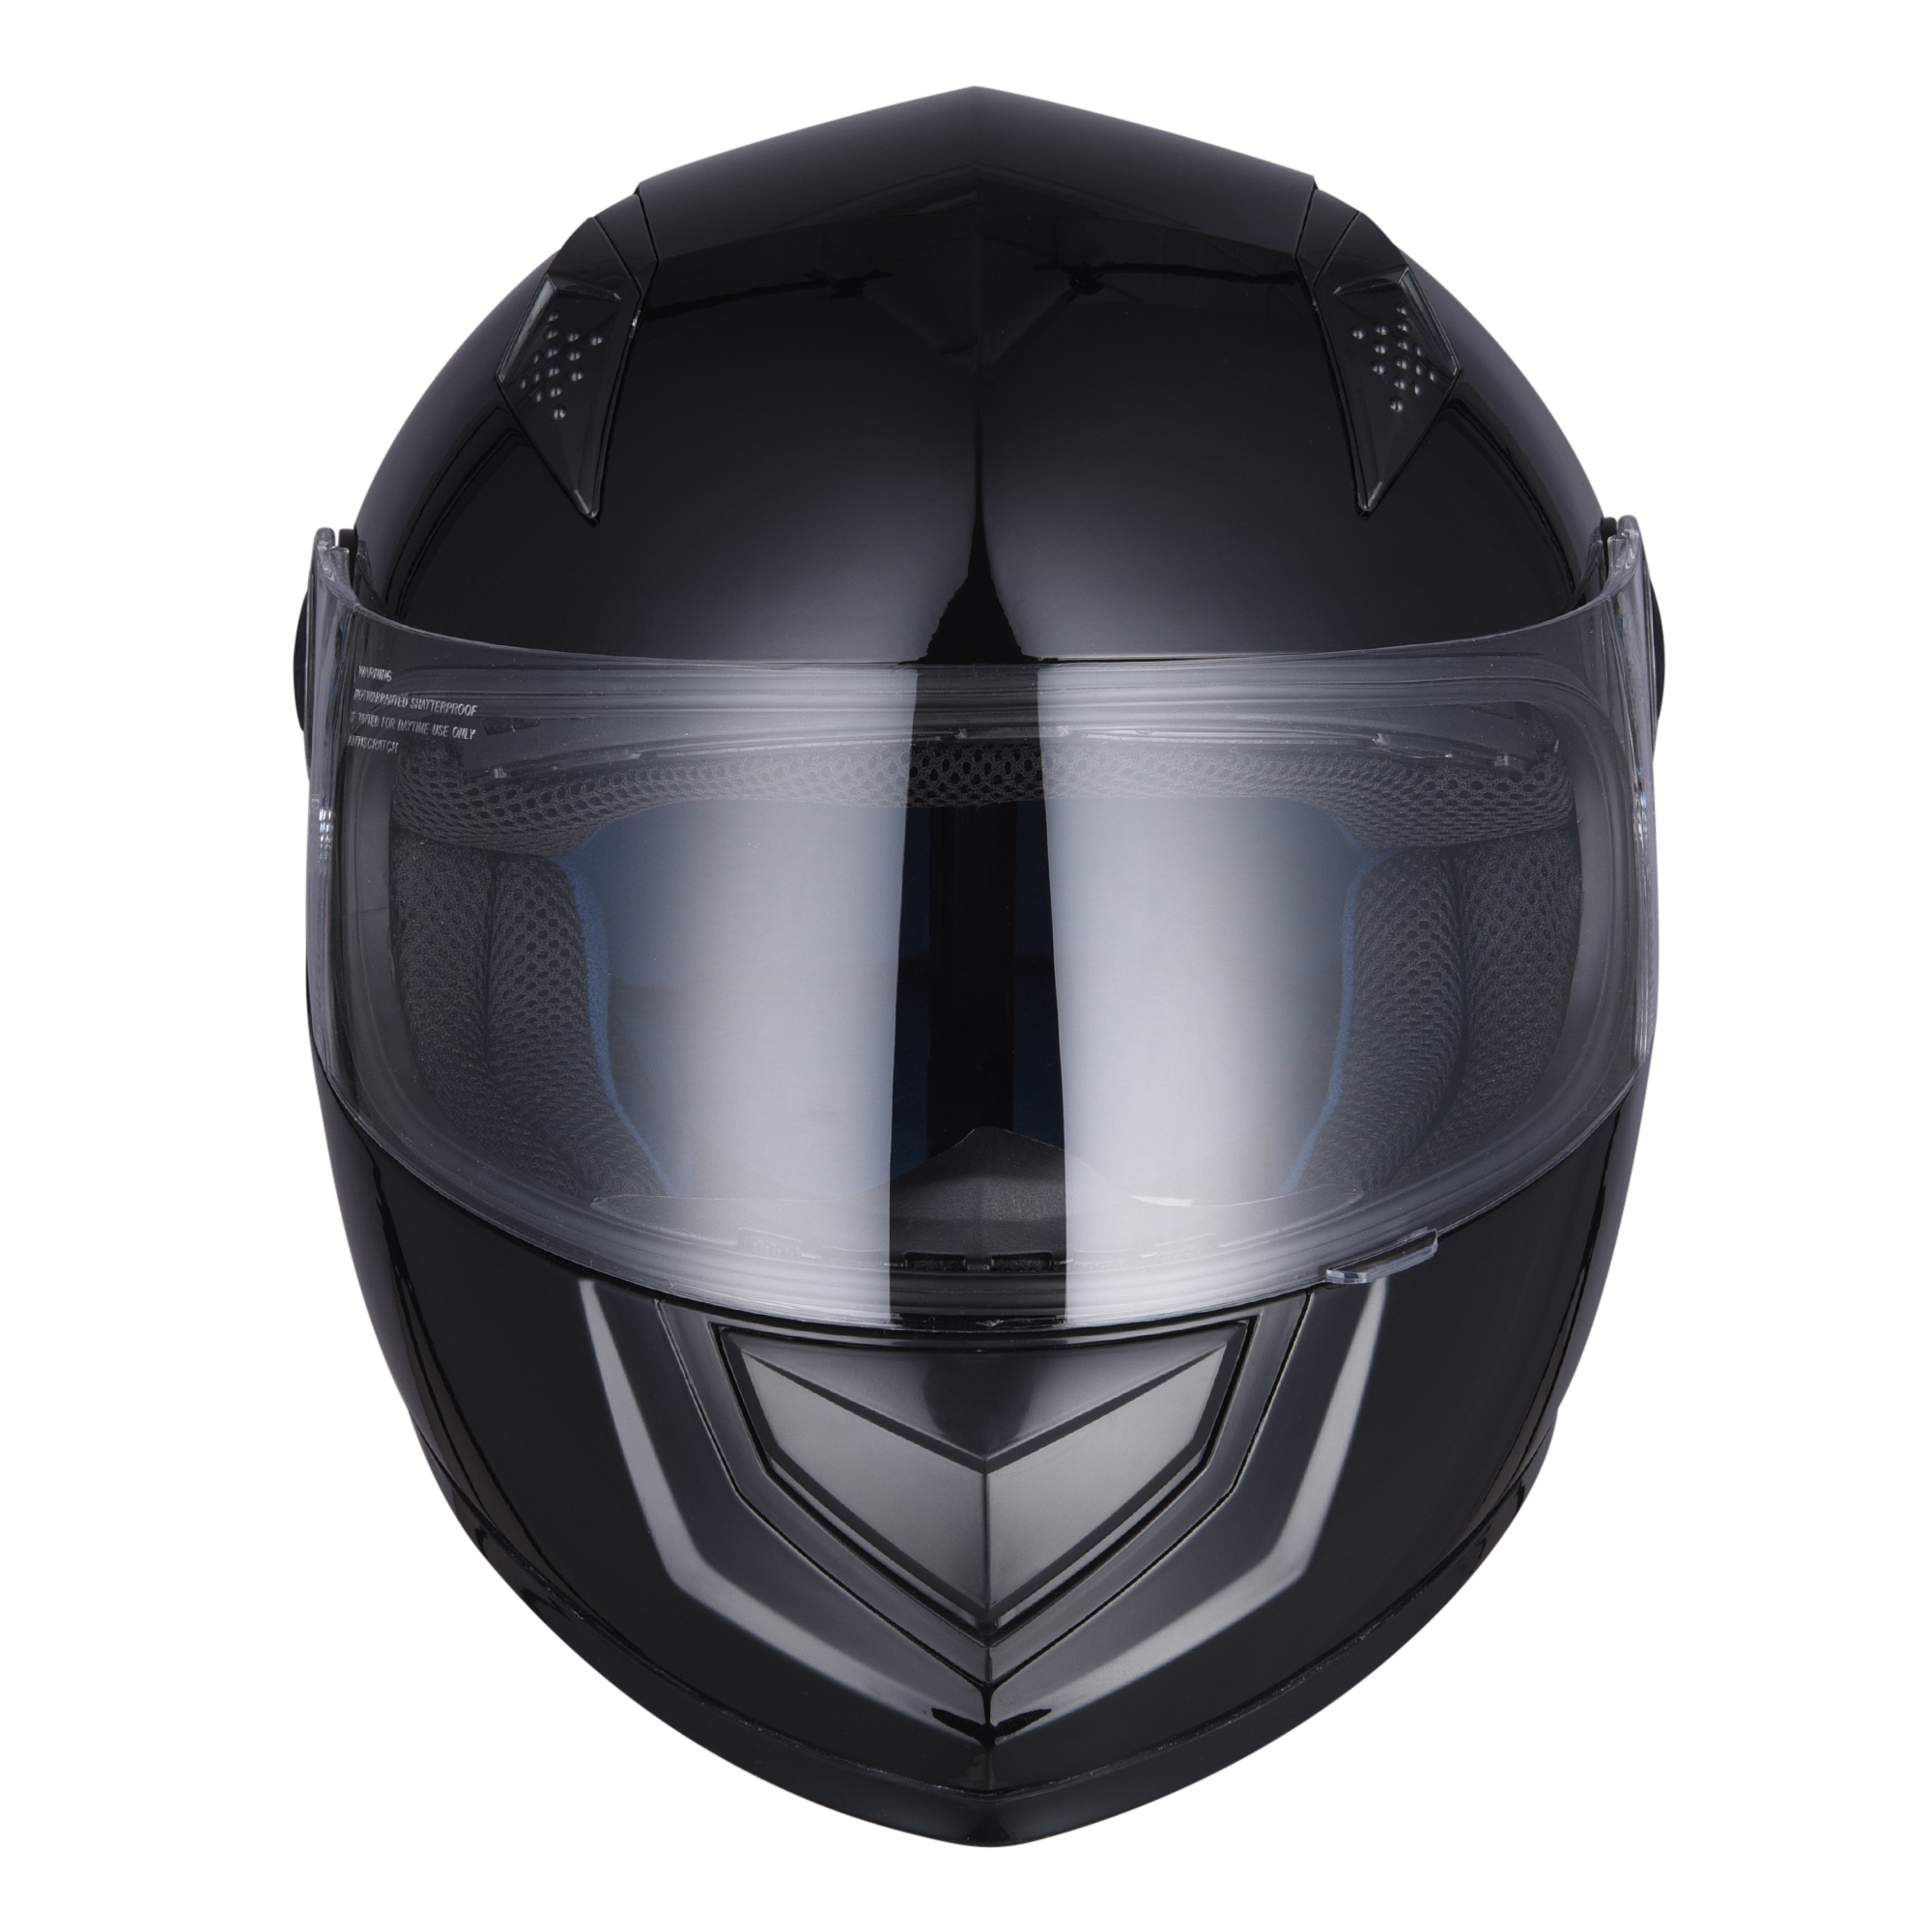 miniature 14 - AHR K12 Full Face Motorcycle Helmet DOT Air Vents Clear Visor Racing S M L XL